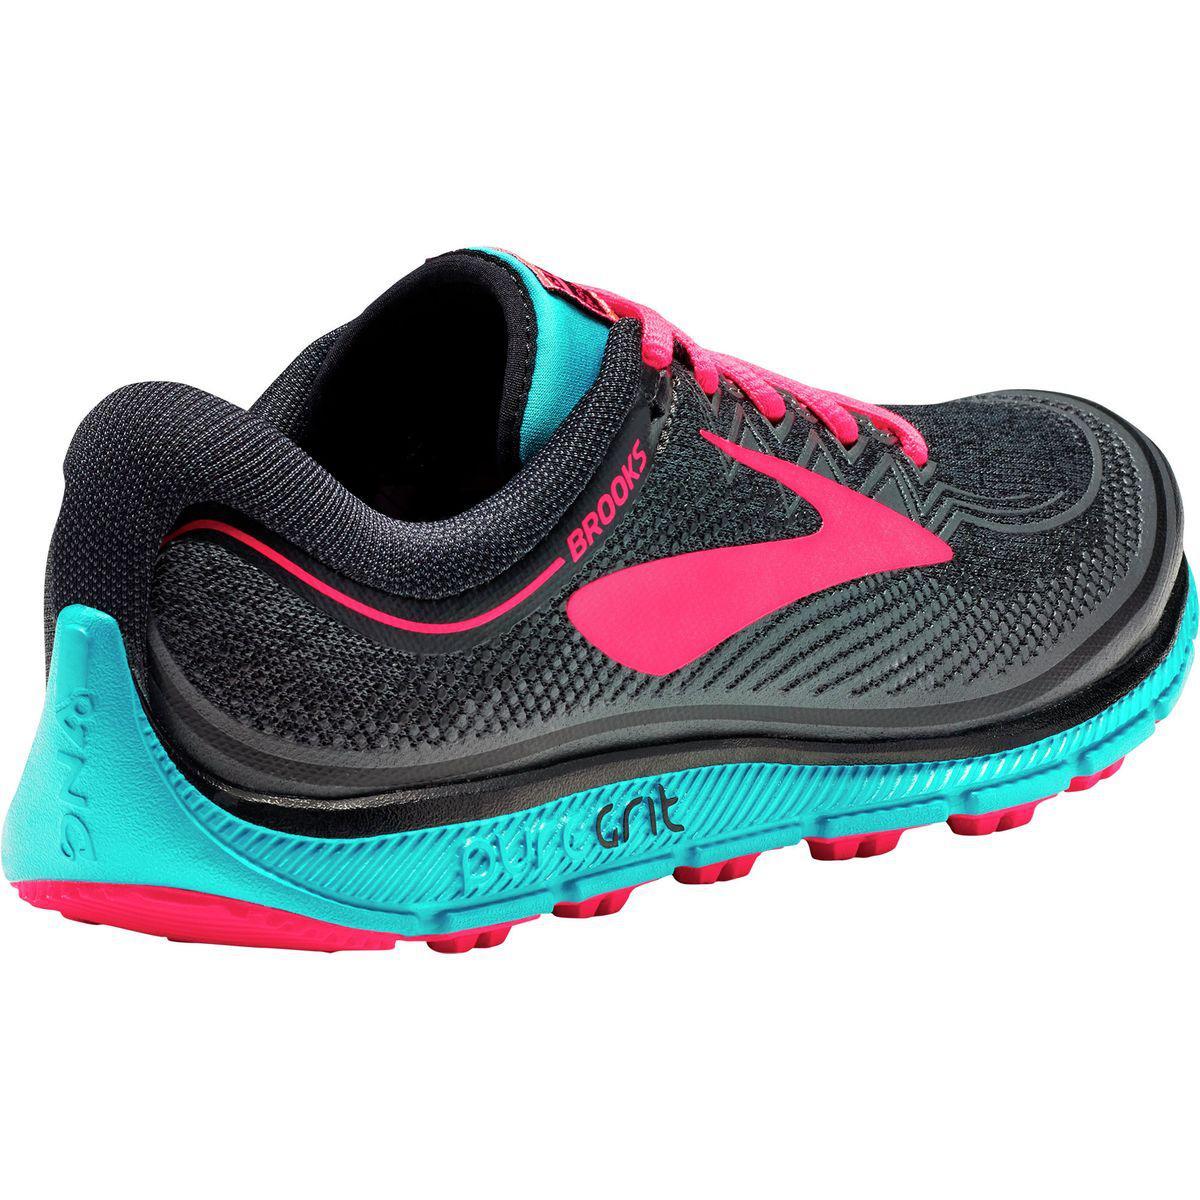 b2d4a3f30065a Lyst - Brooks Puregrit 6 Trail Running Shoe